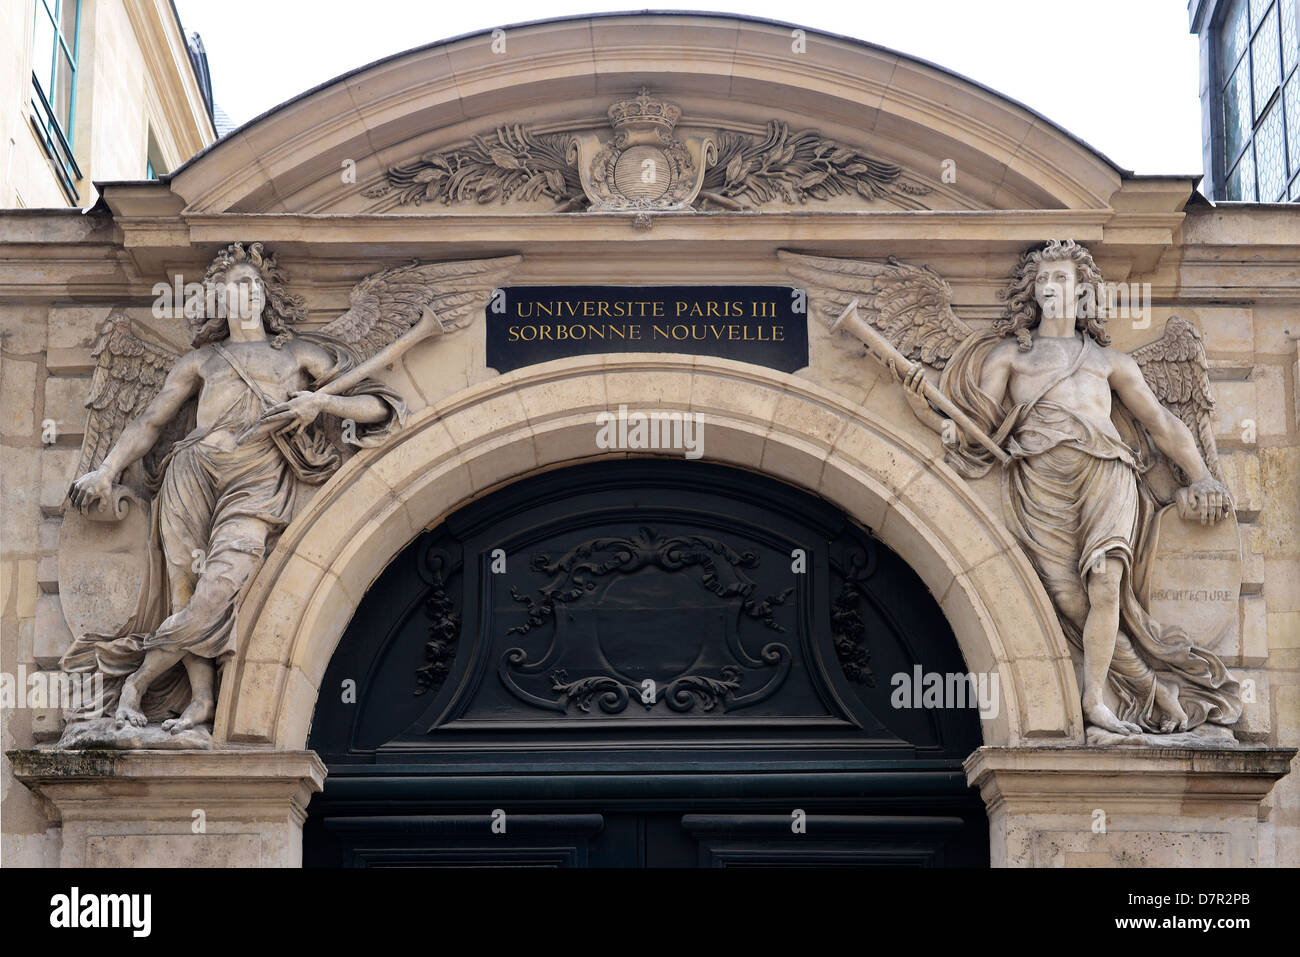 Sorbonne university in the Latin Quarter, Paris - France - Stock Image